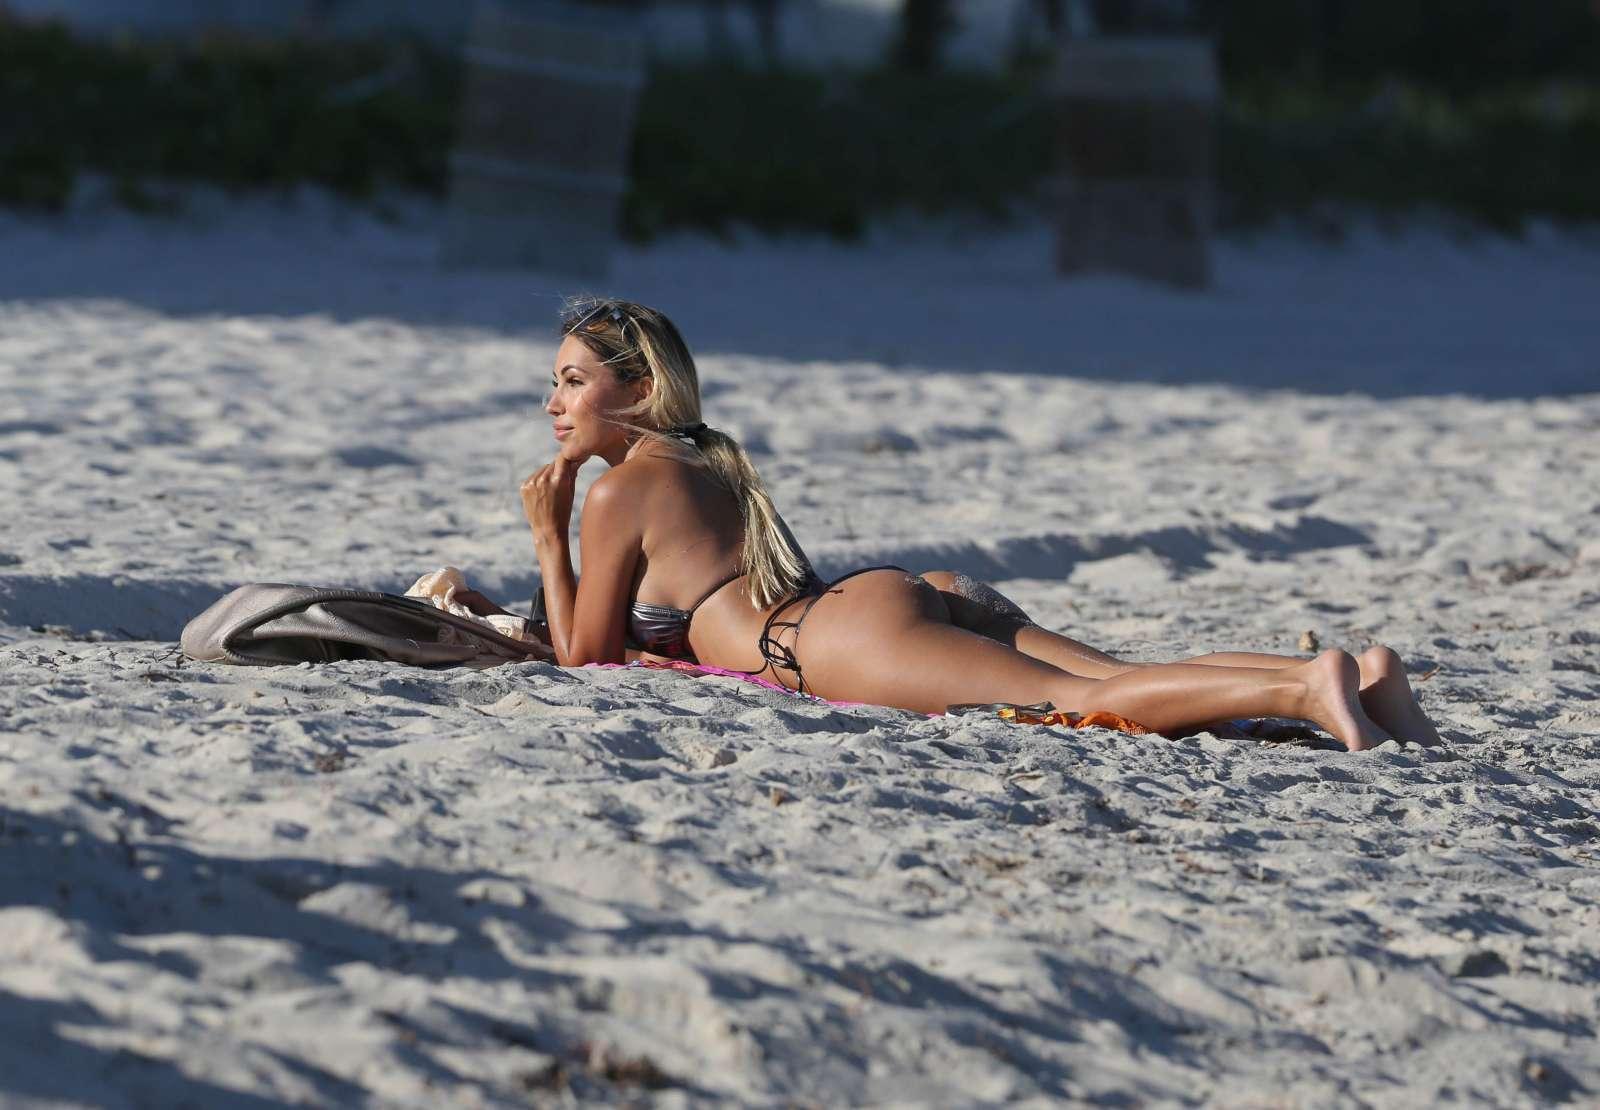 Maria Hering 2017 : Maria Hering in Bikini 2017 -18